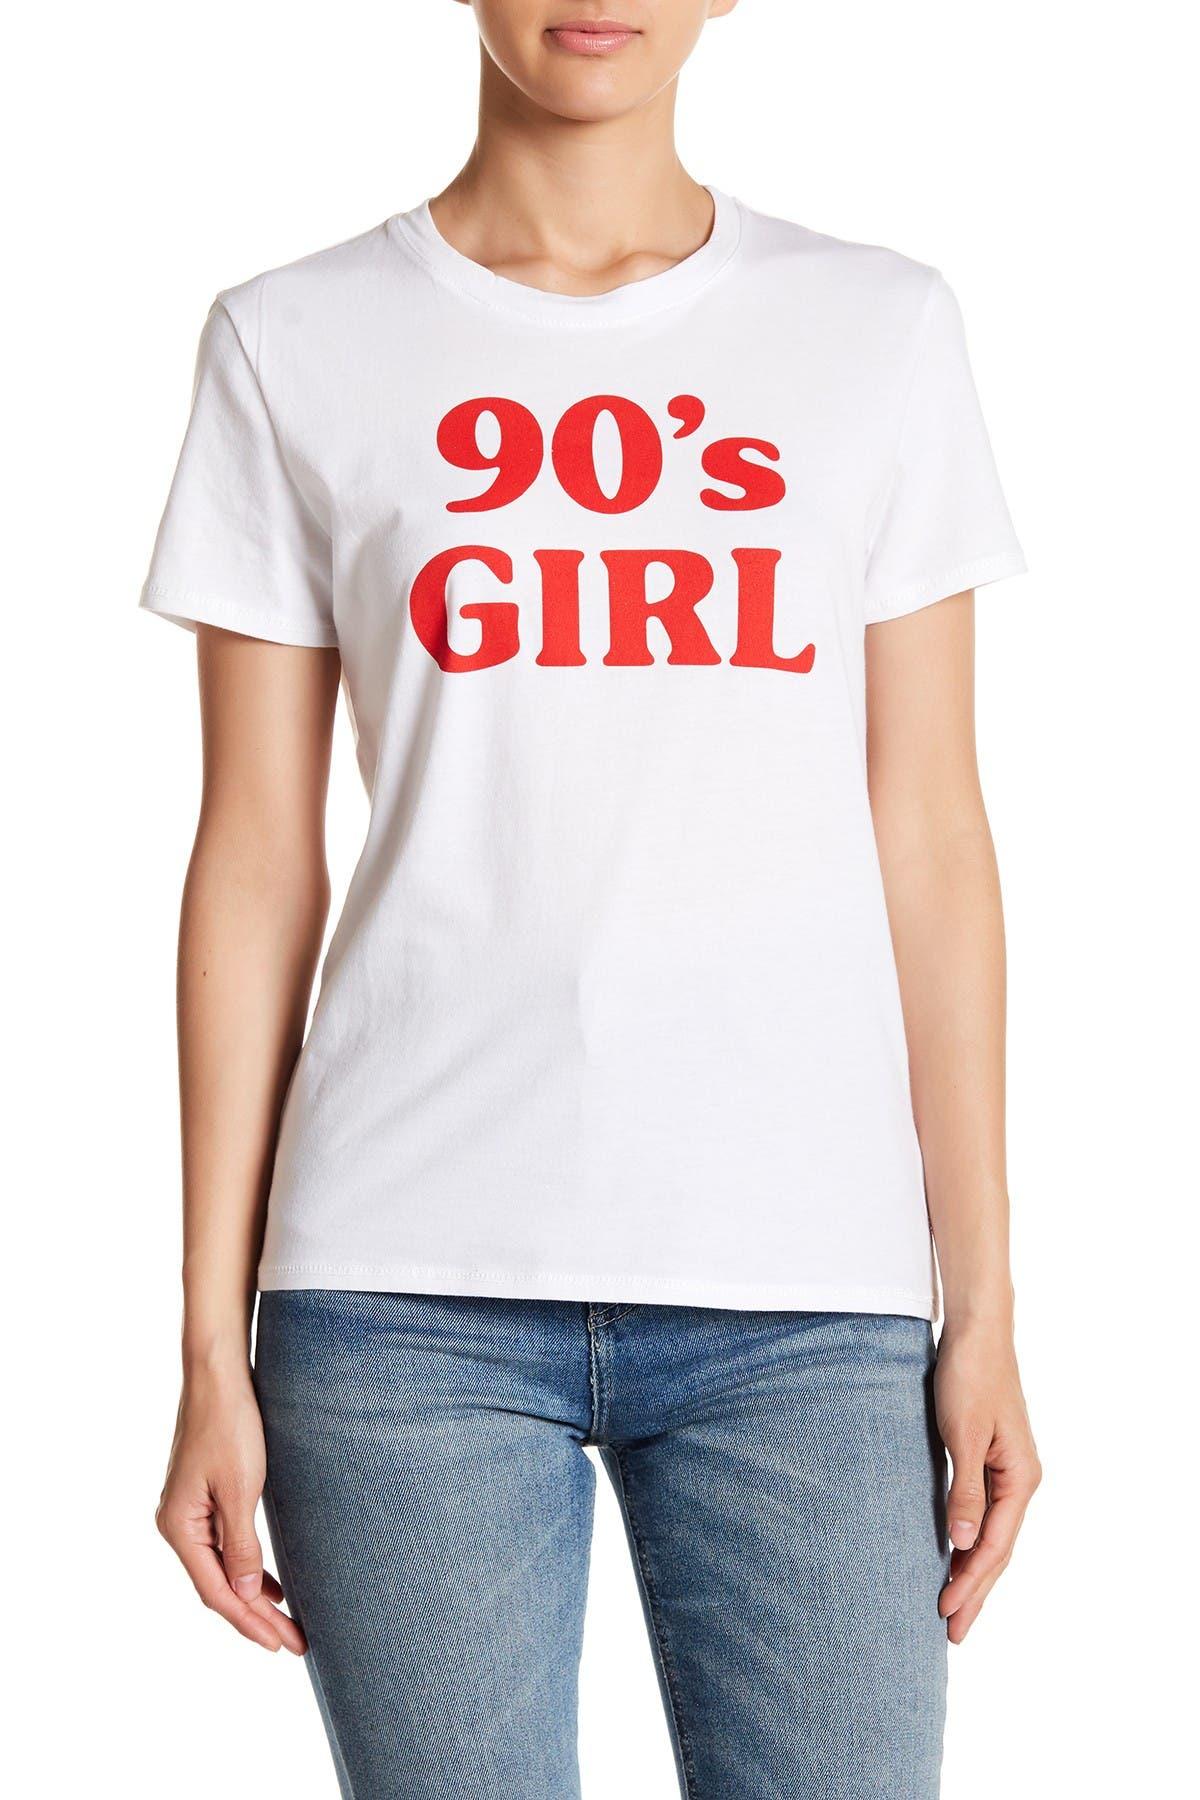 Image of Prince Peter 90's Girl T-Shirt